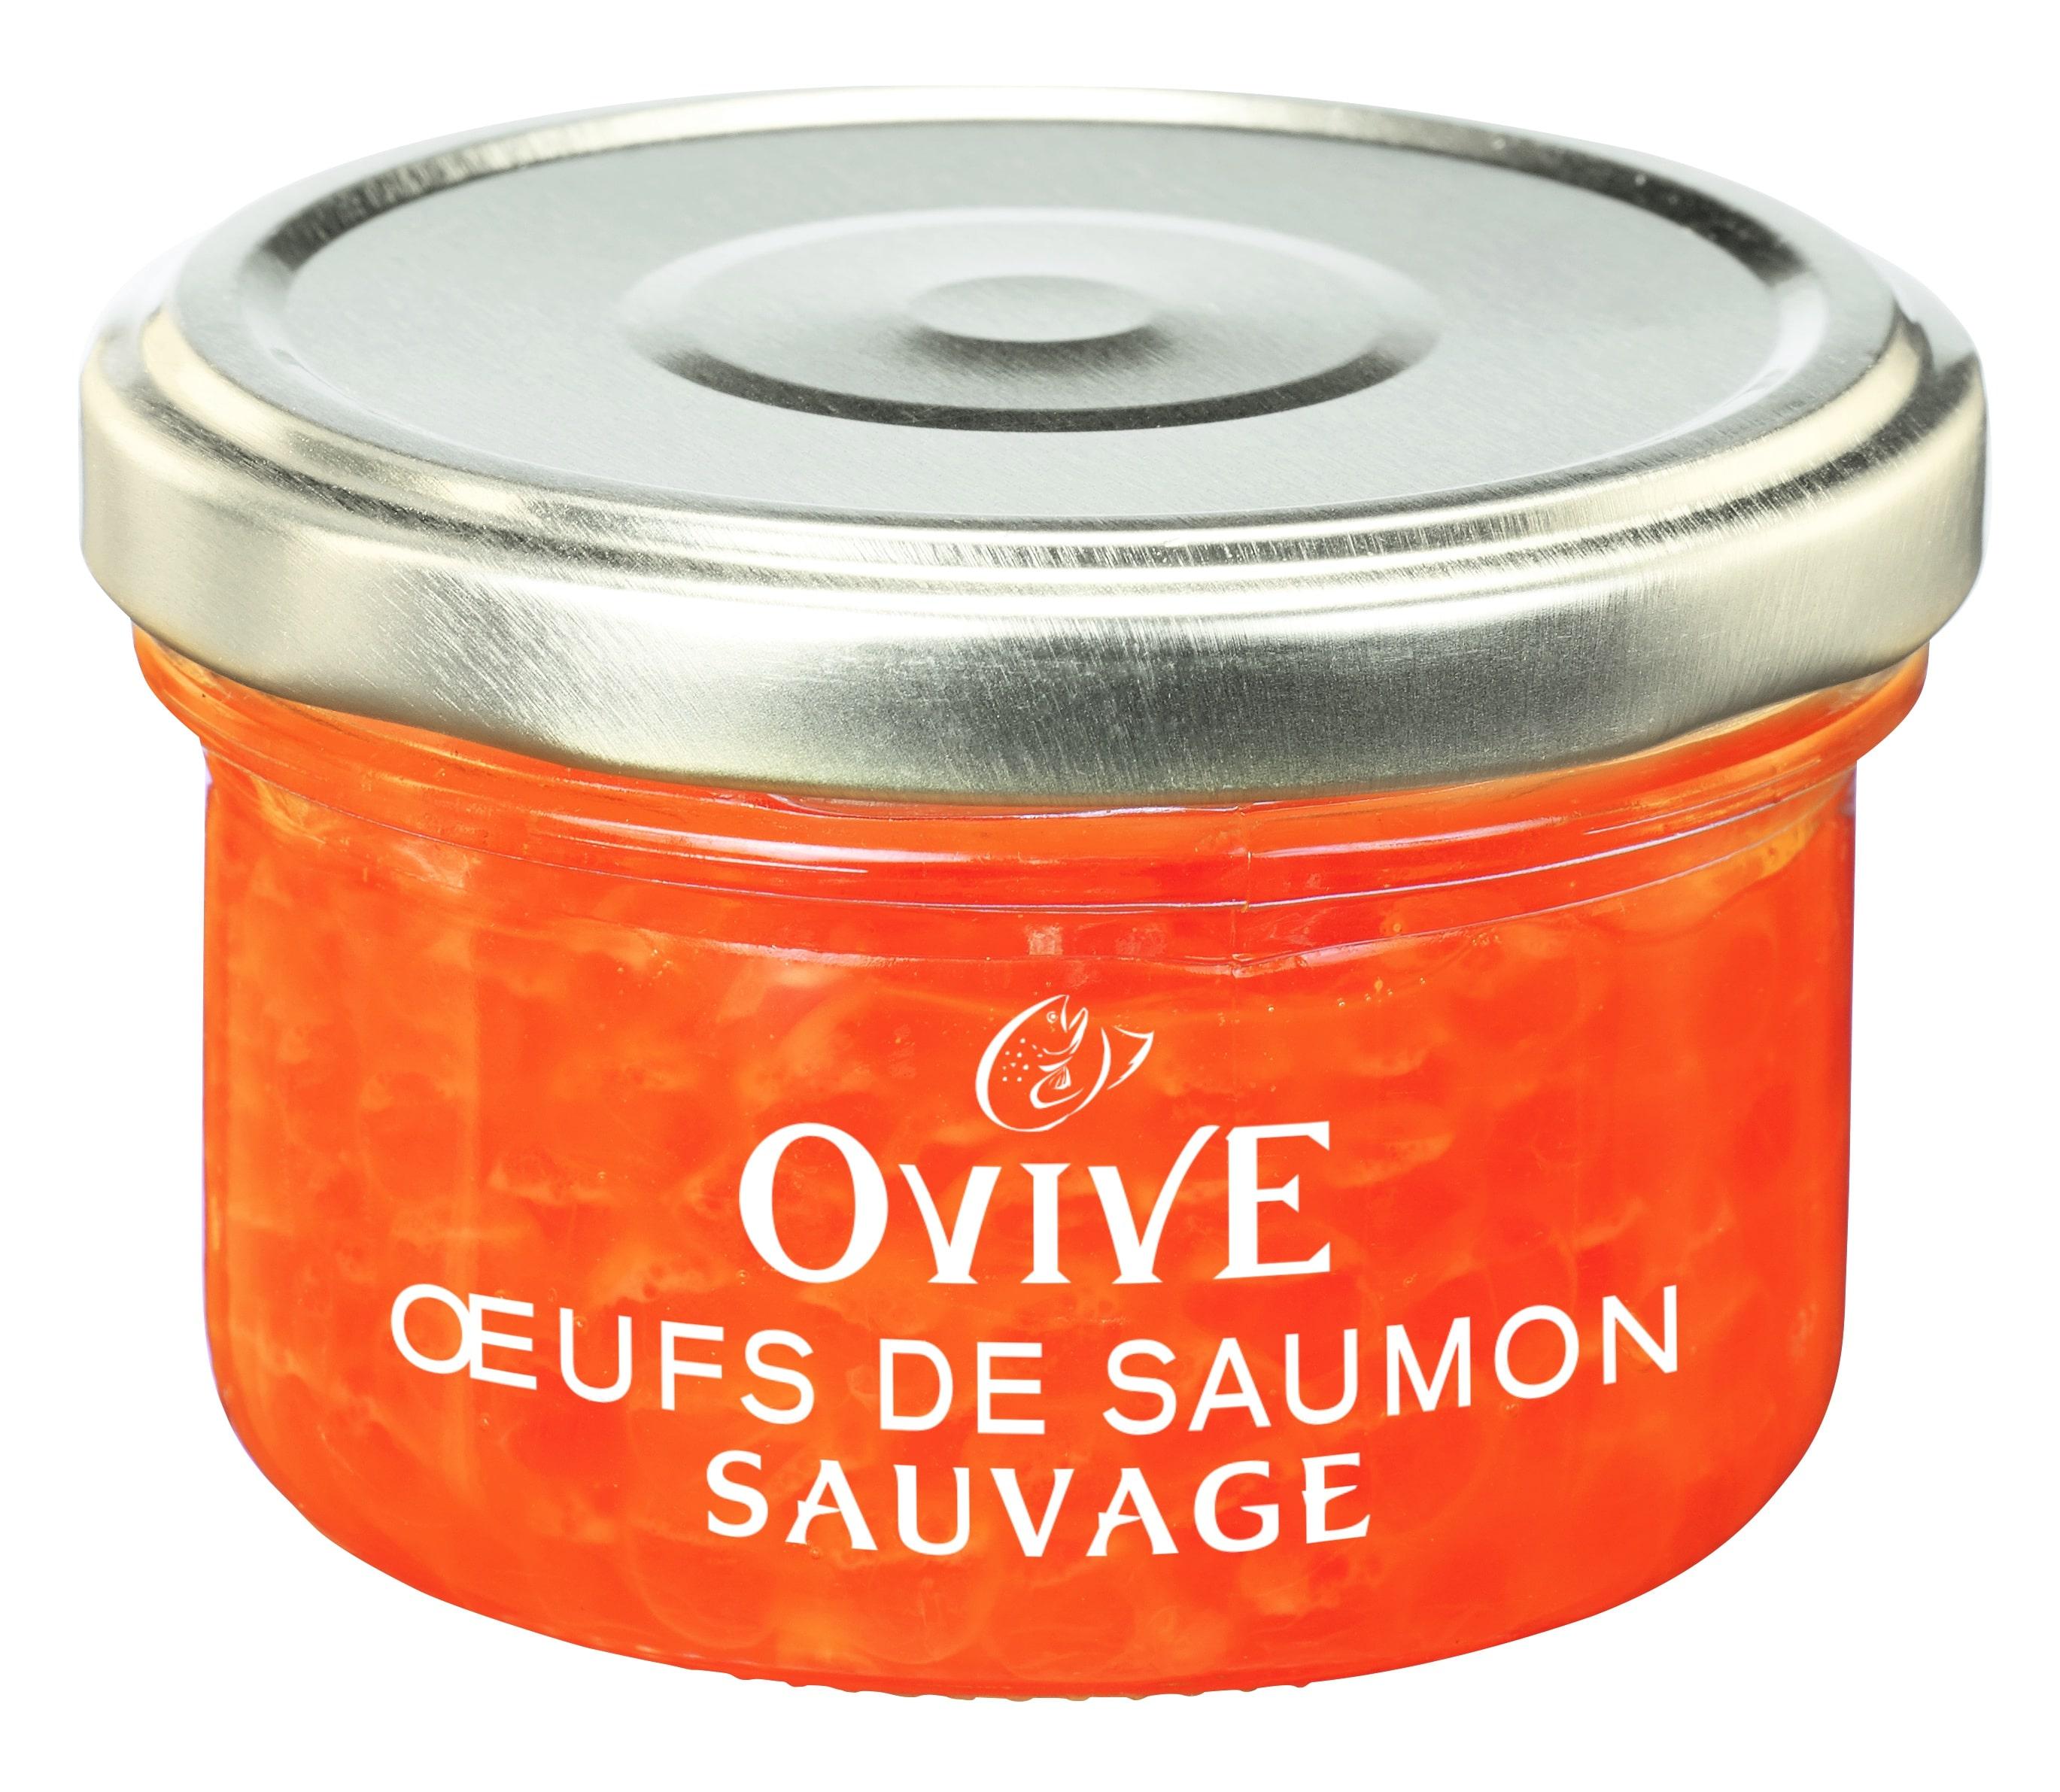 Oeufs de saumon sauvage OVIVE